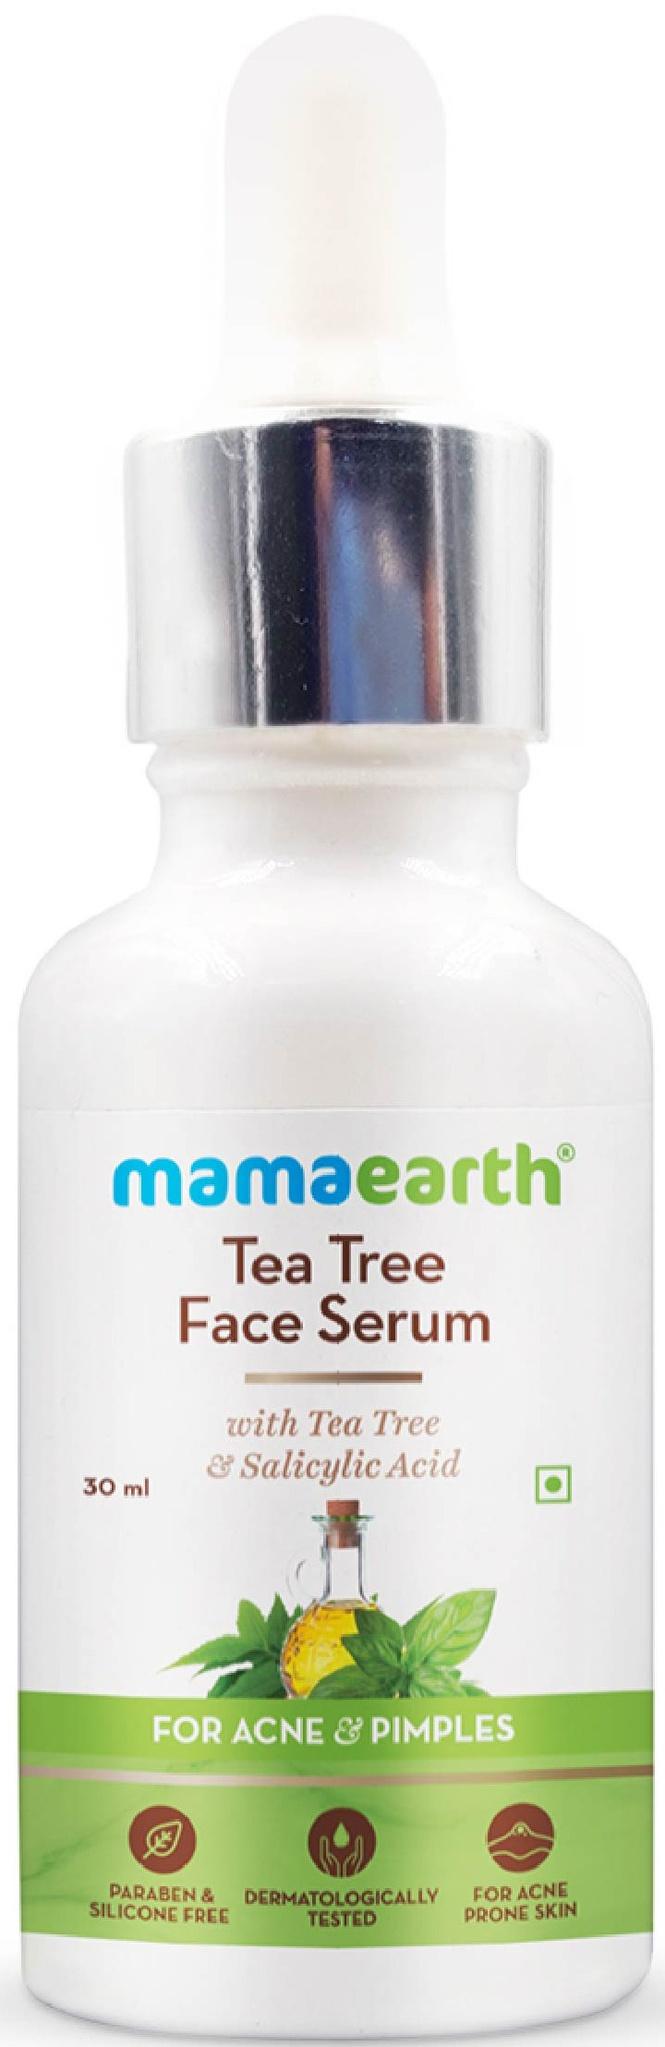 Mamaearth Tea Tree Face Serum